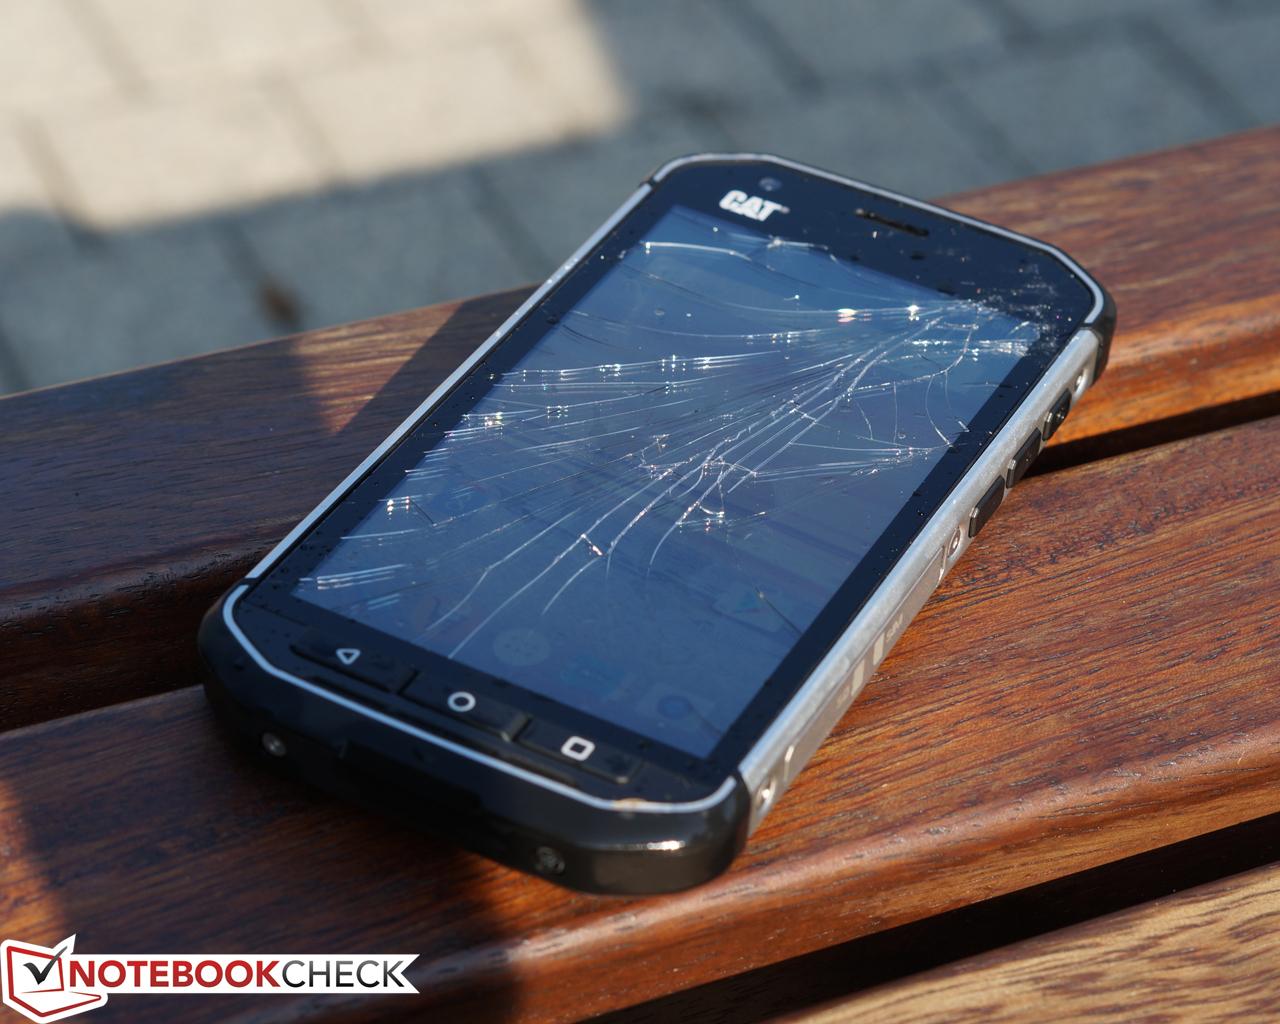 Cat S40 Smartphone Review Notebookcheck Net Reviews